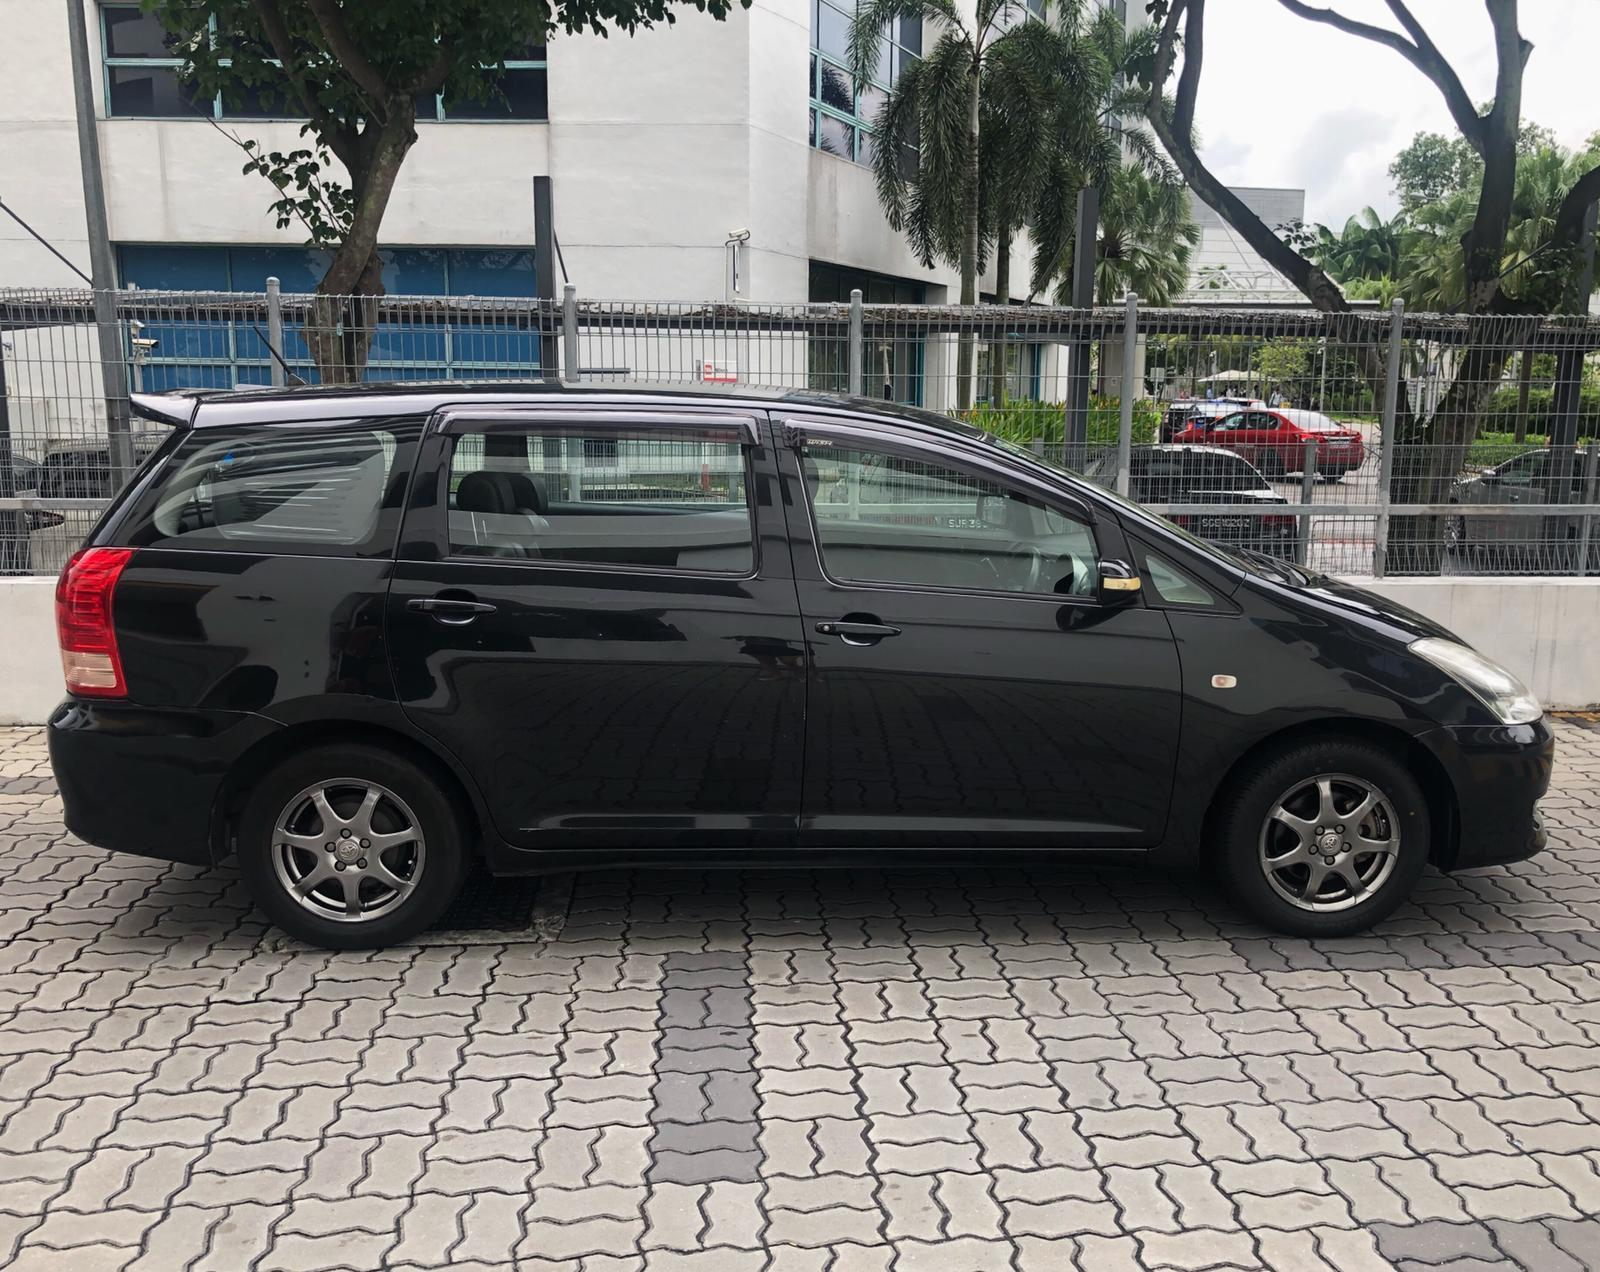 Toyota Wish Grab Gojek Ryde Personal use Cheapest Car Rental